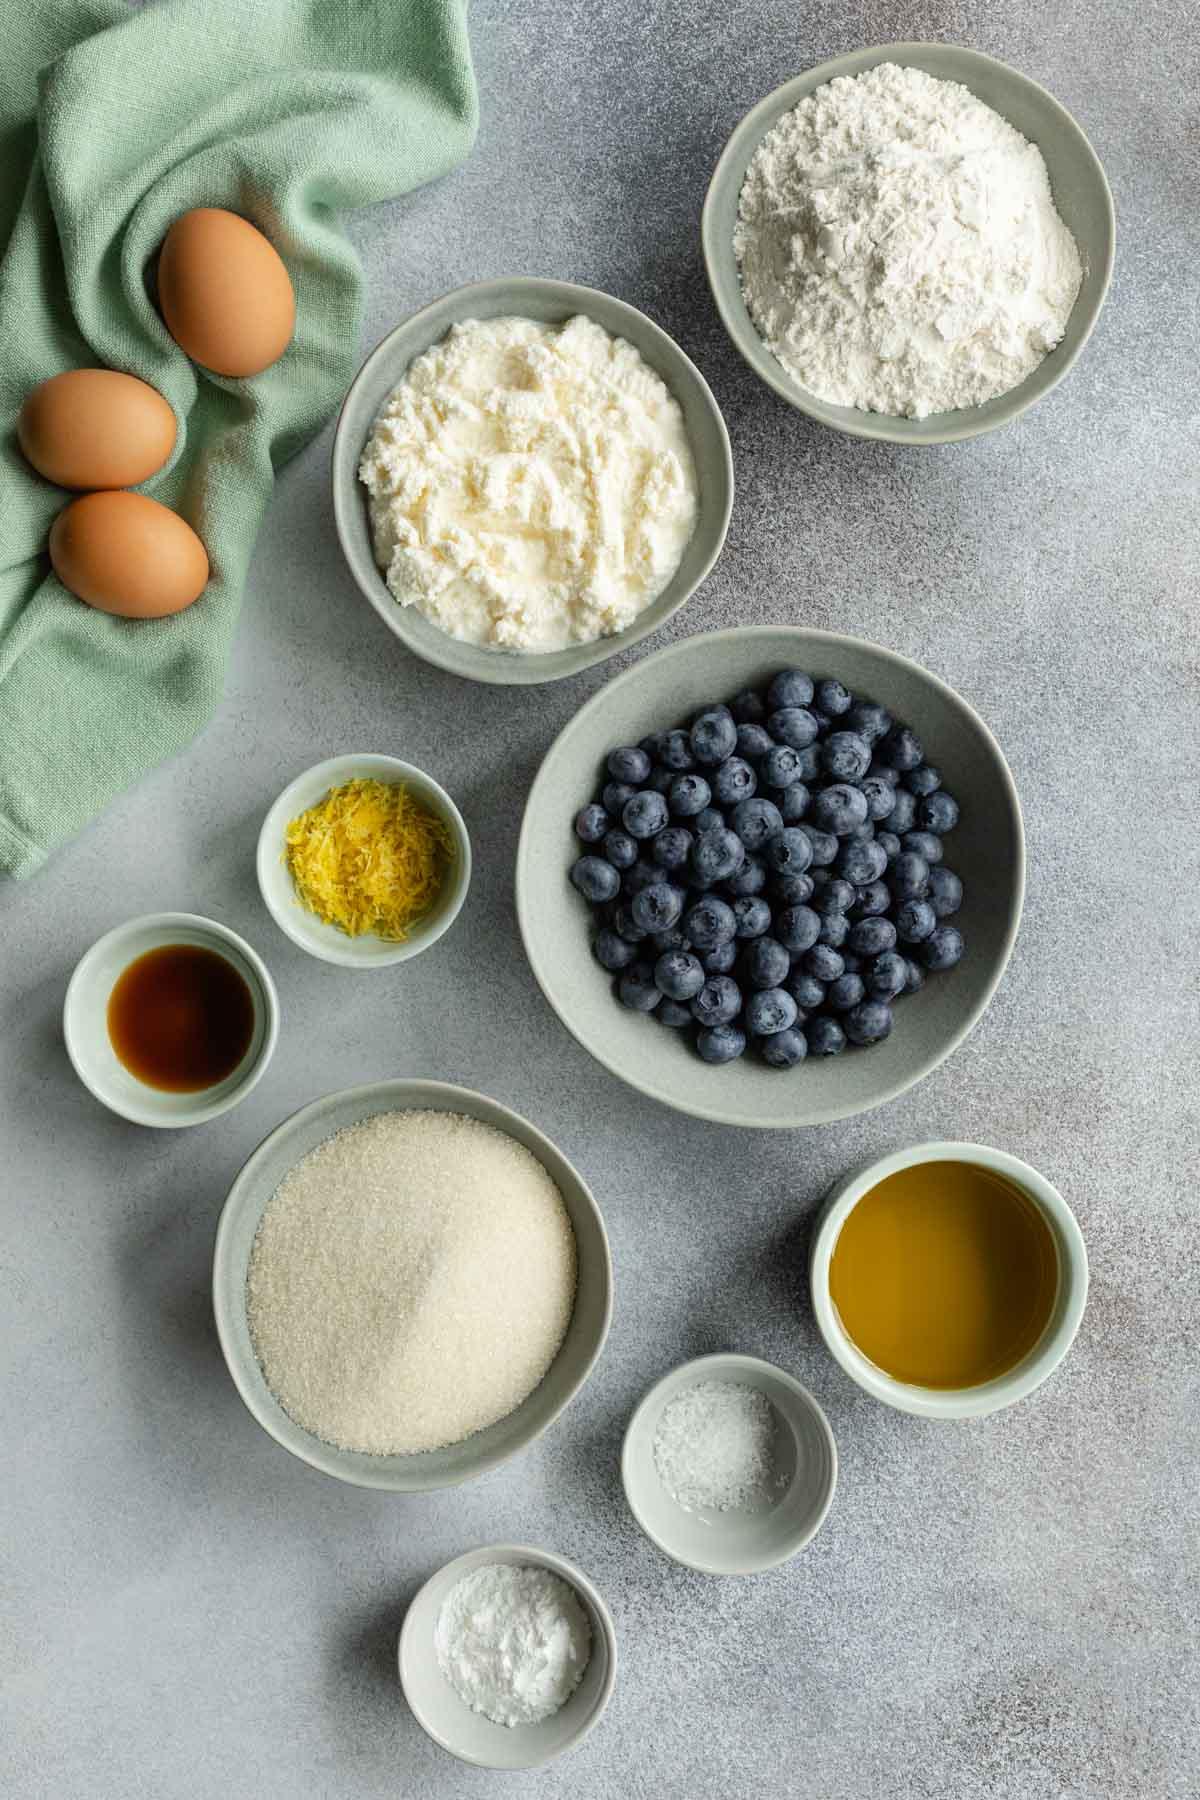 Ingredients to make blueberry cake arranged individually.